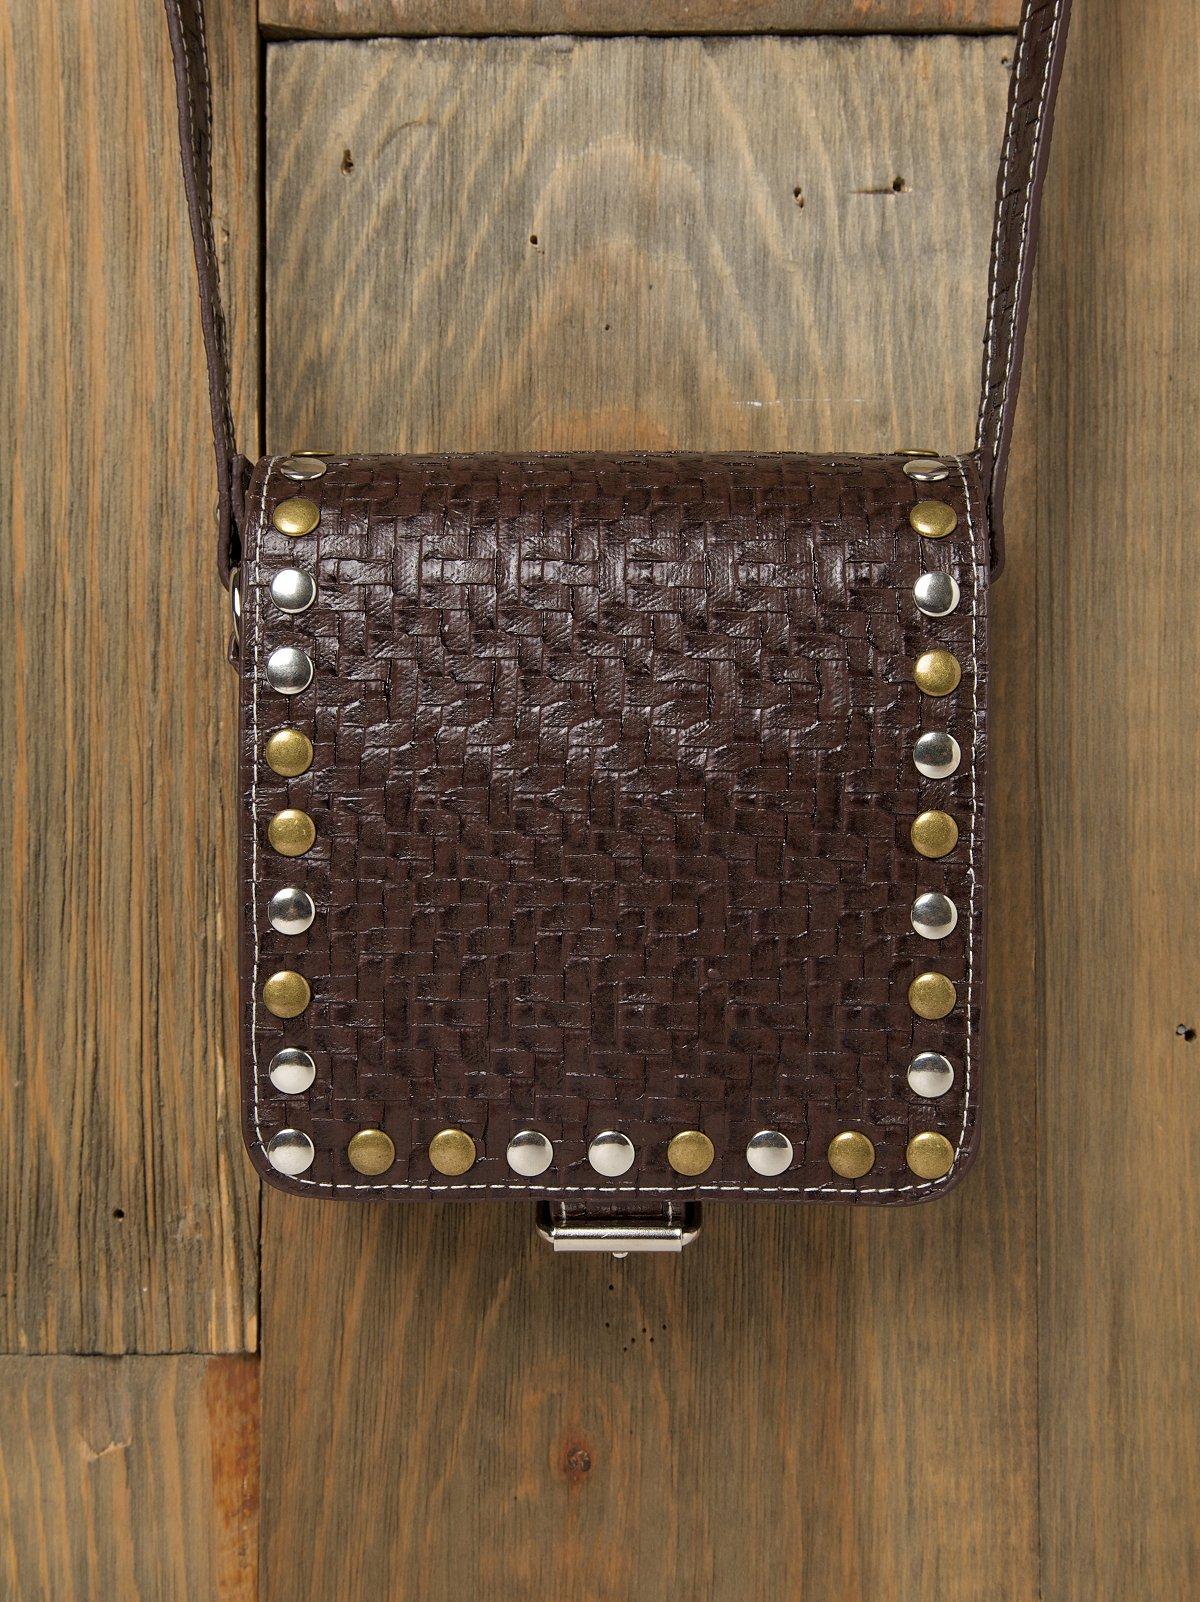 Doub's Woven Crossbody Bag